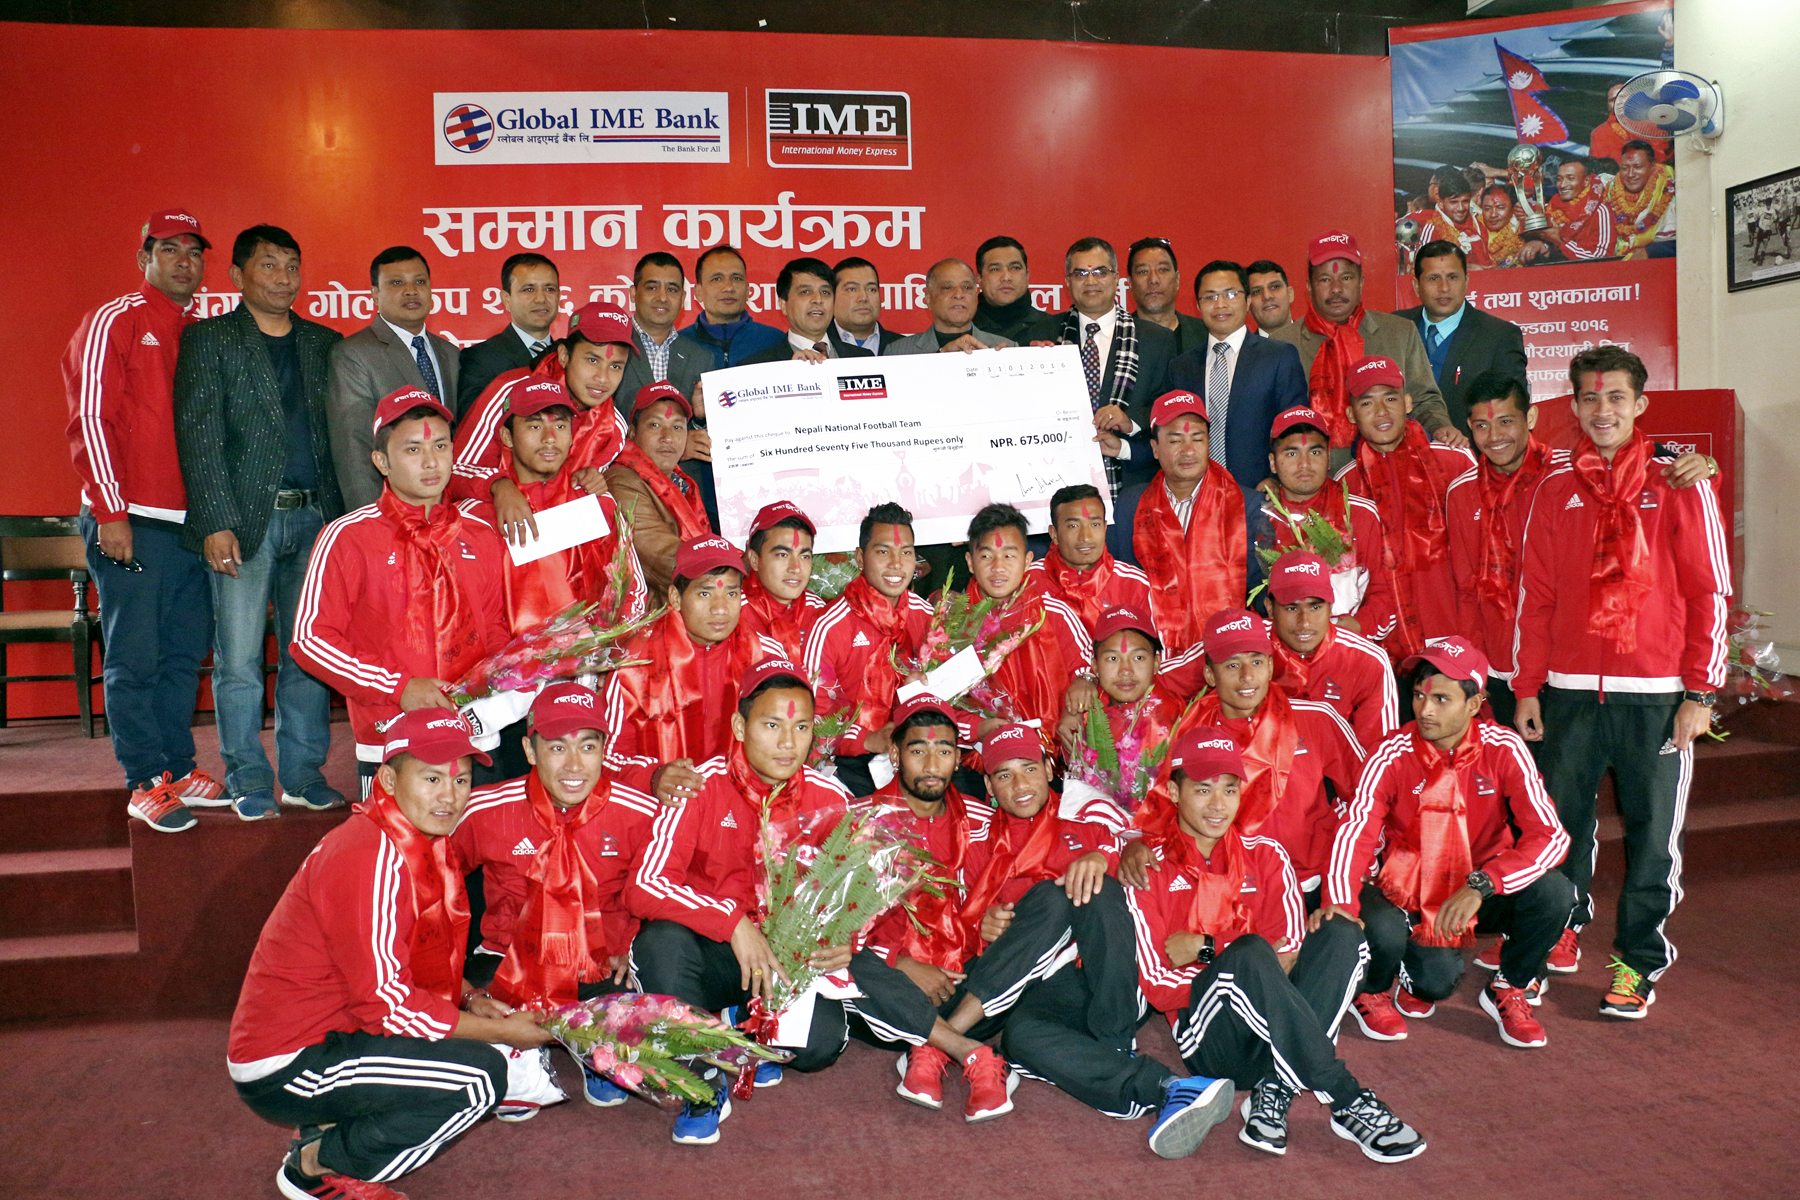 Bangabandu Gold Cup winning players being felicitated by Global IME Bank in Kathmandu on Sunday, January 31, 2016. Photo: RSS